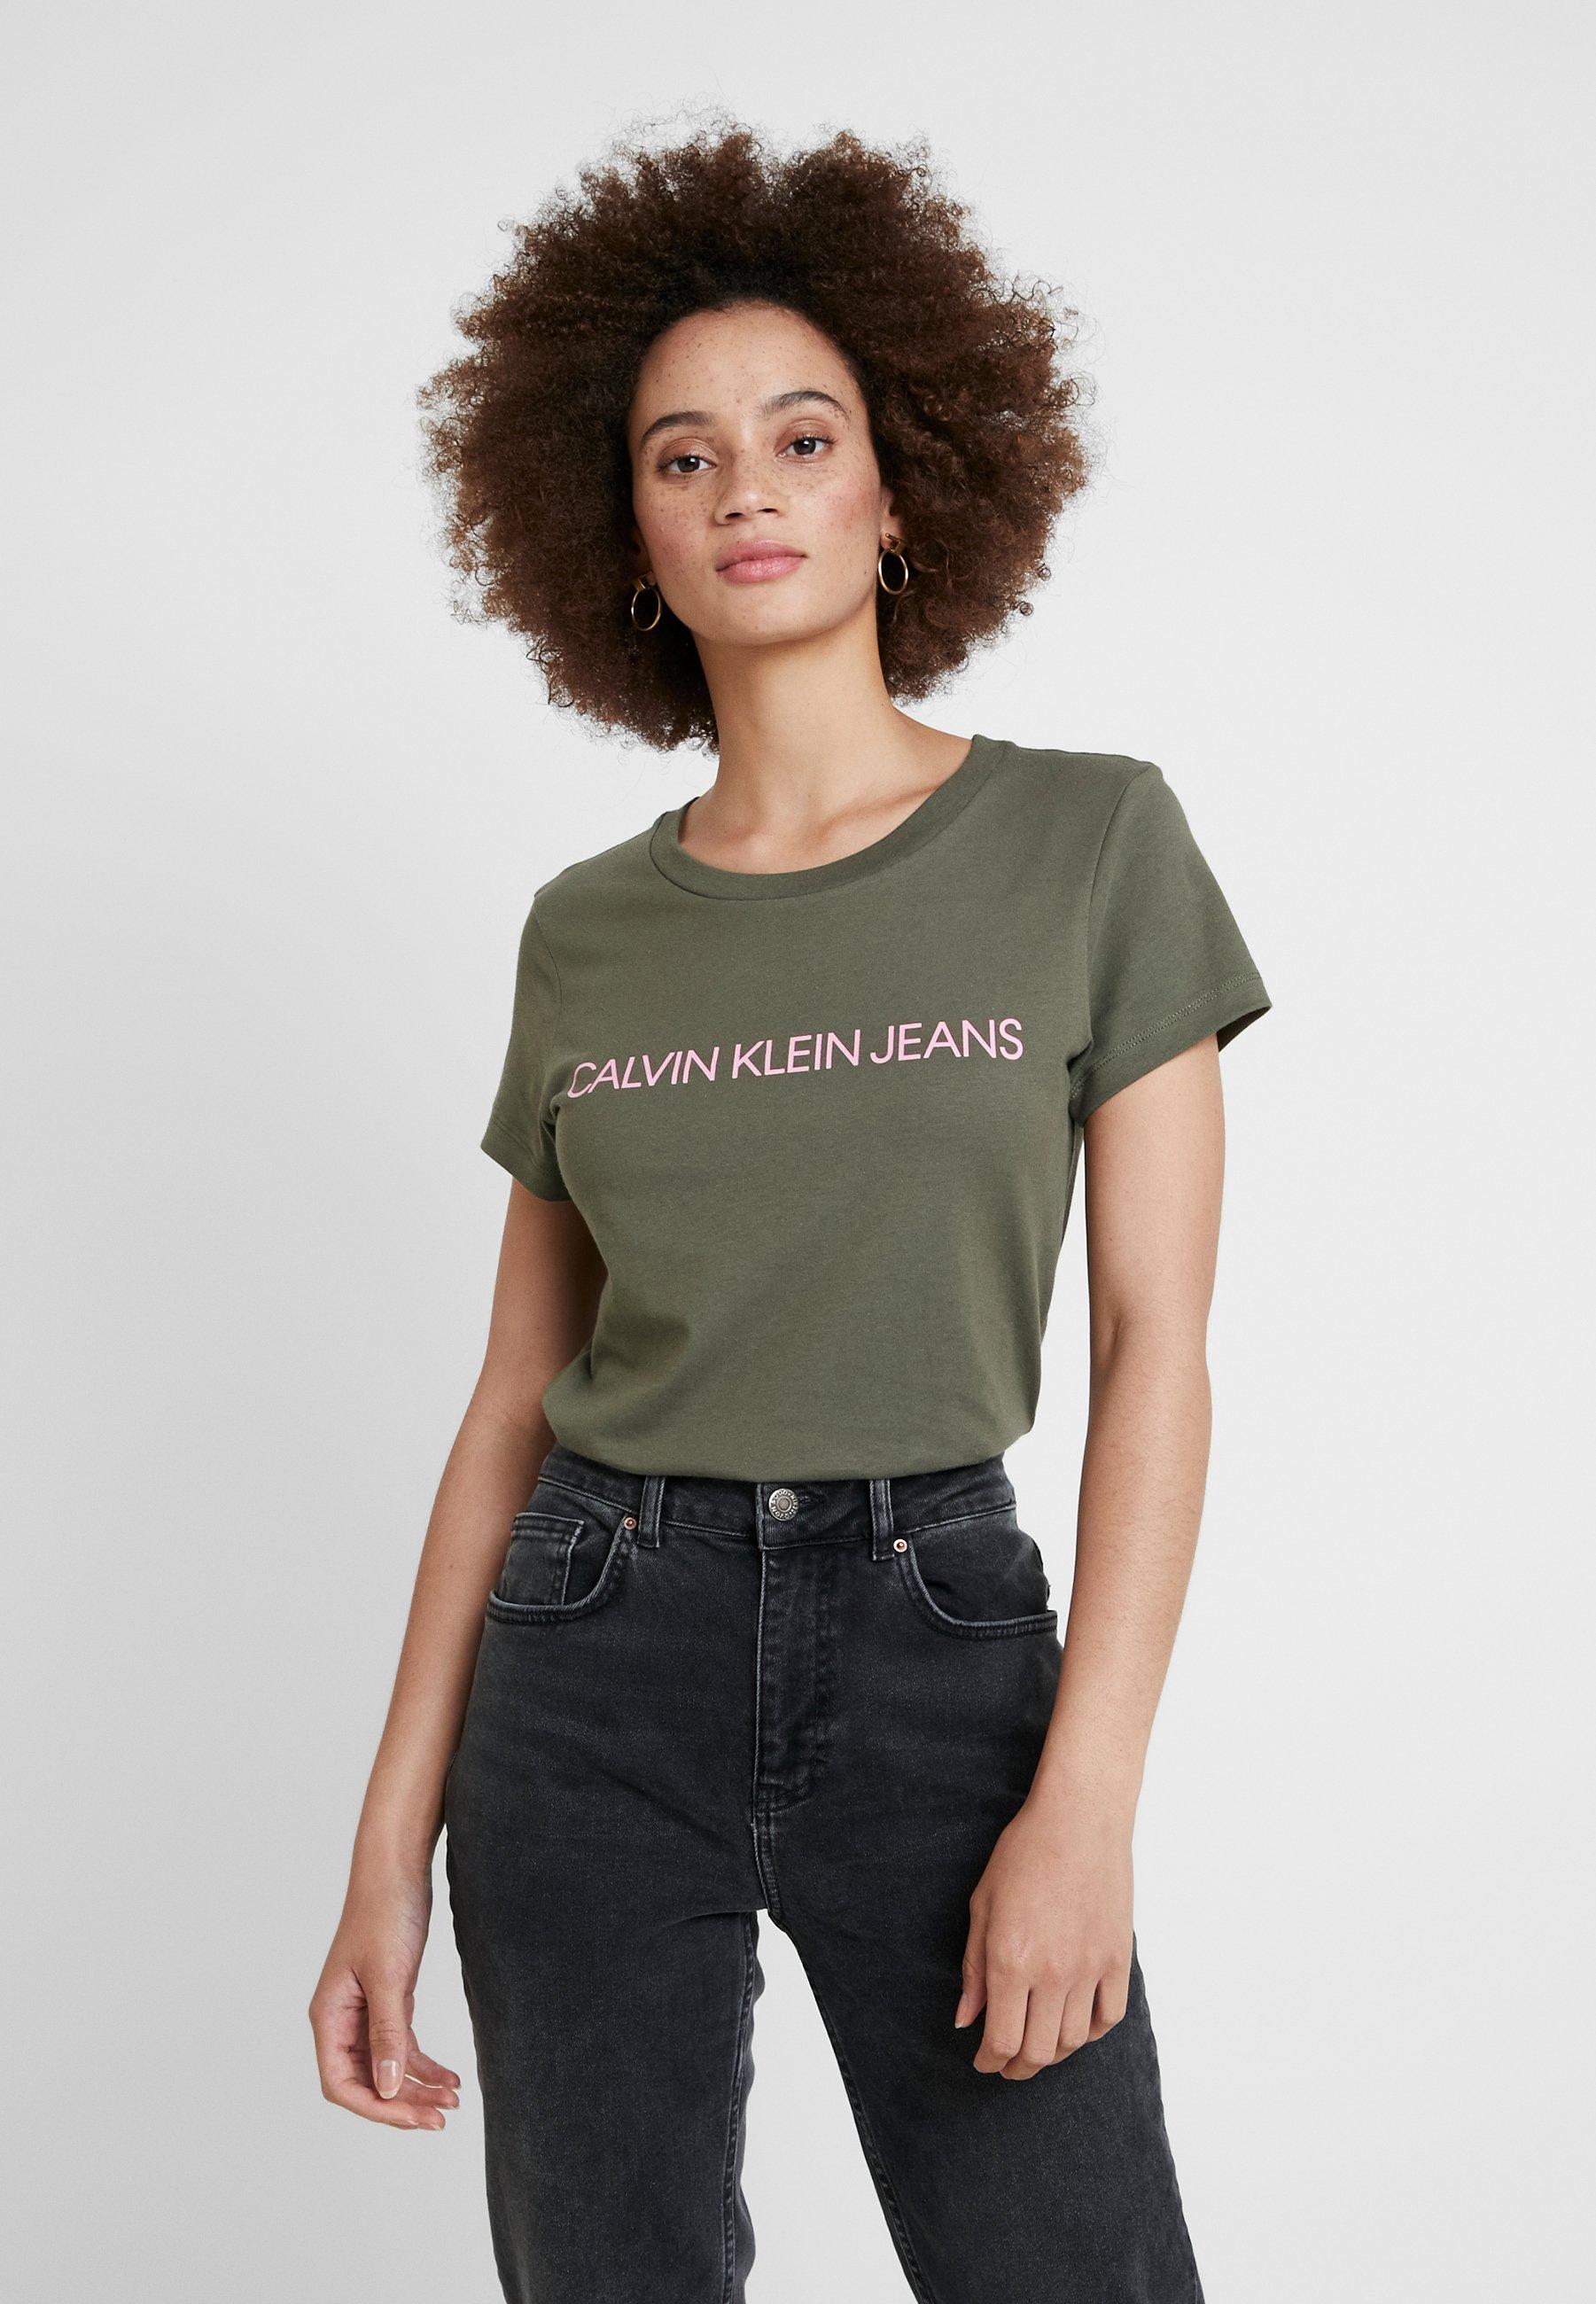 Pink Calvin Klein prism Slim Fit Jeans shirt Grape Leaf Logo Imprimé Institutional TeeT EWIH9YD2